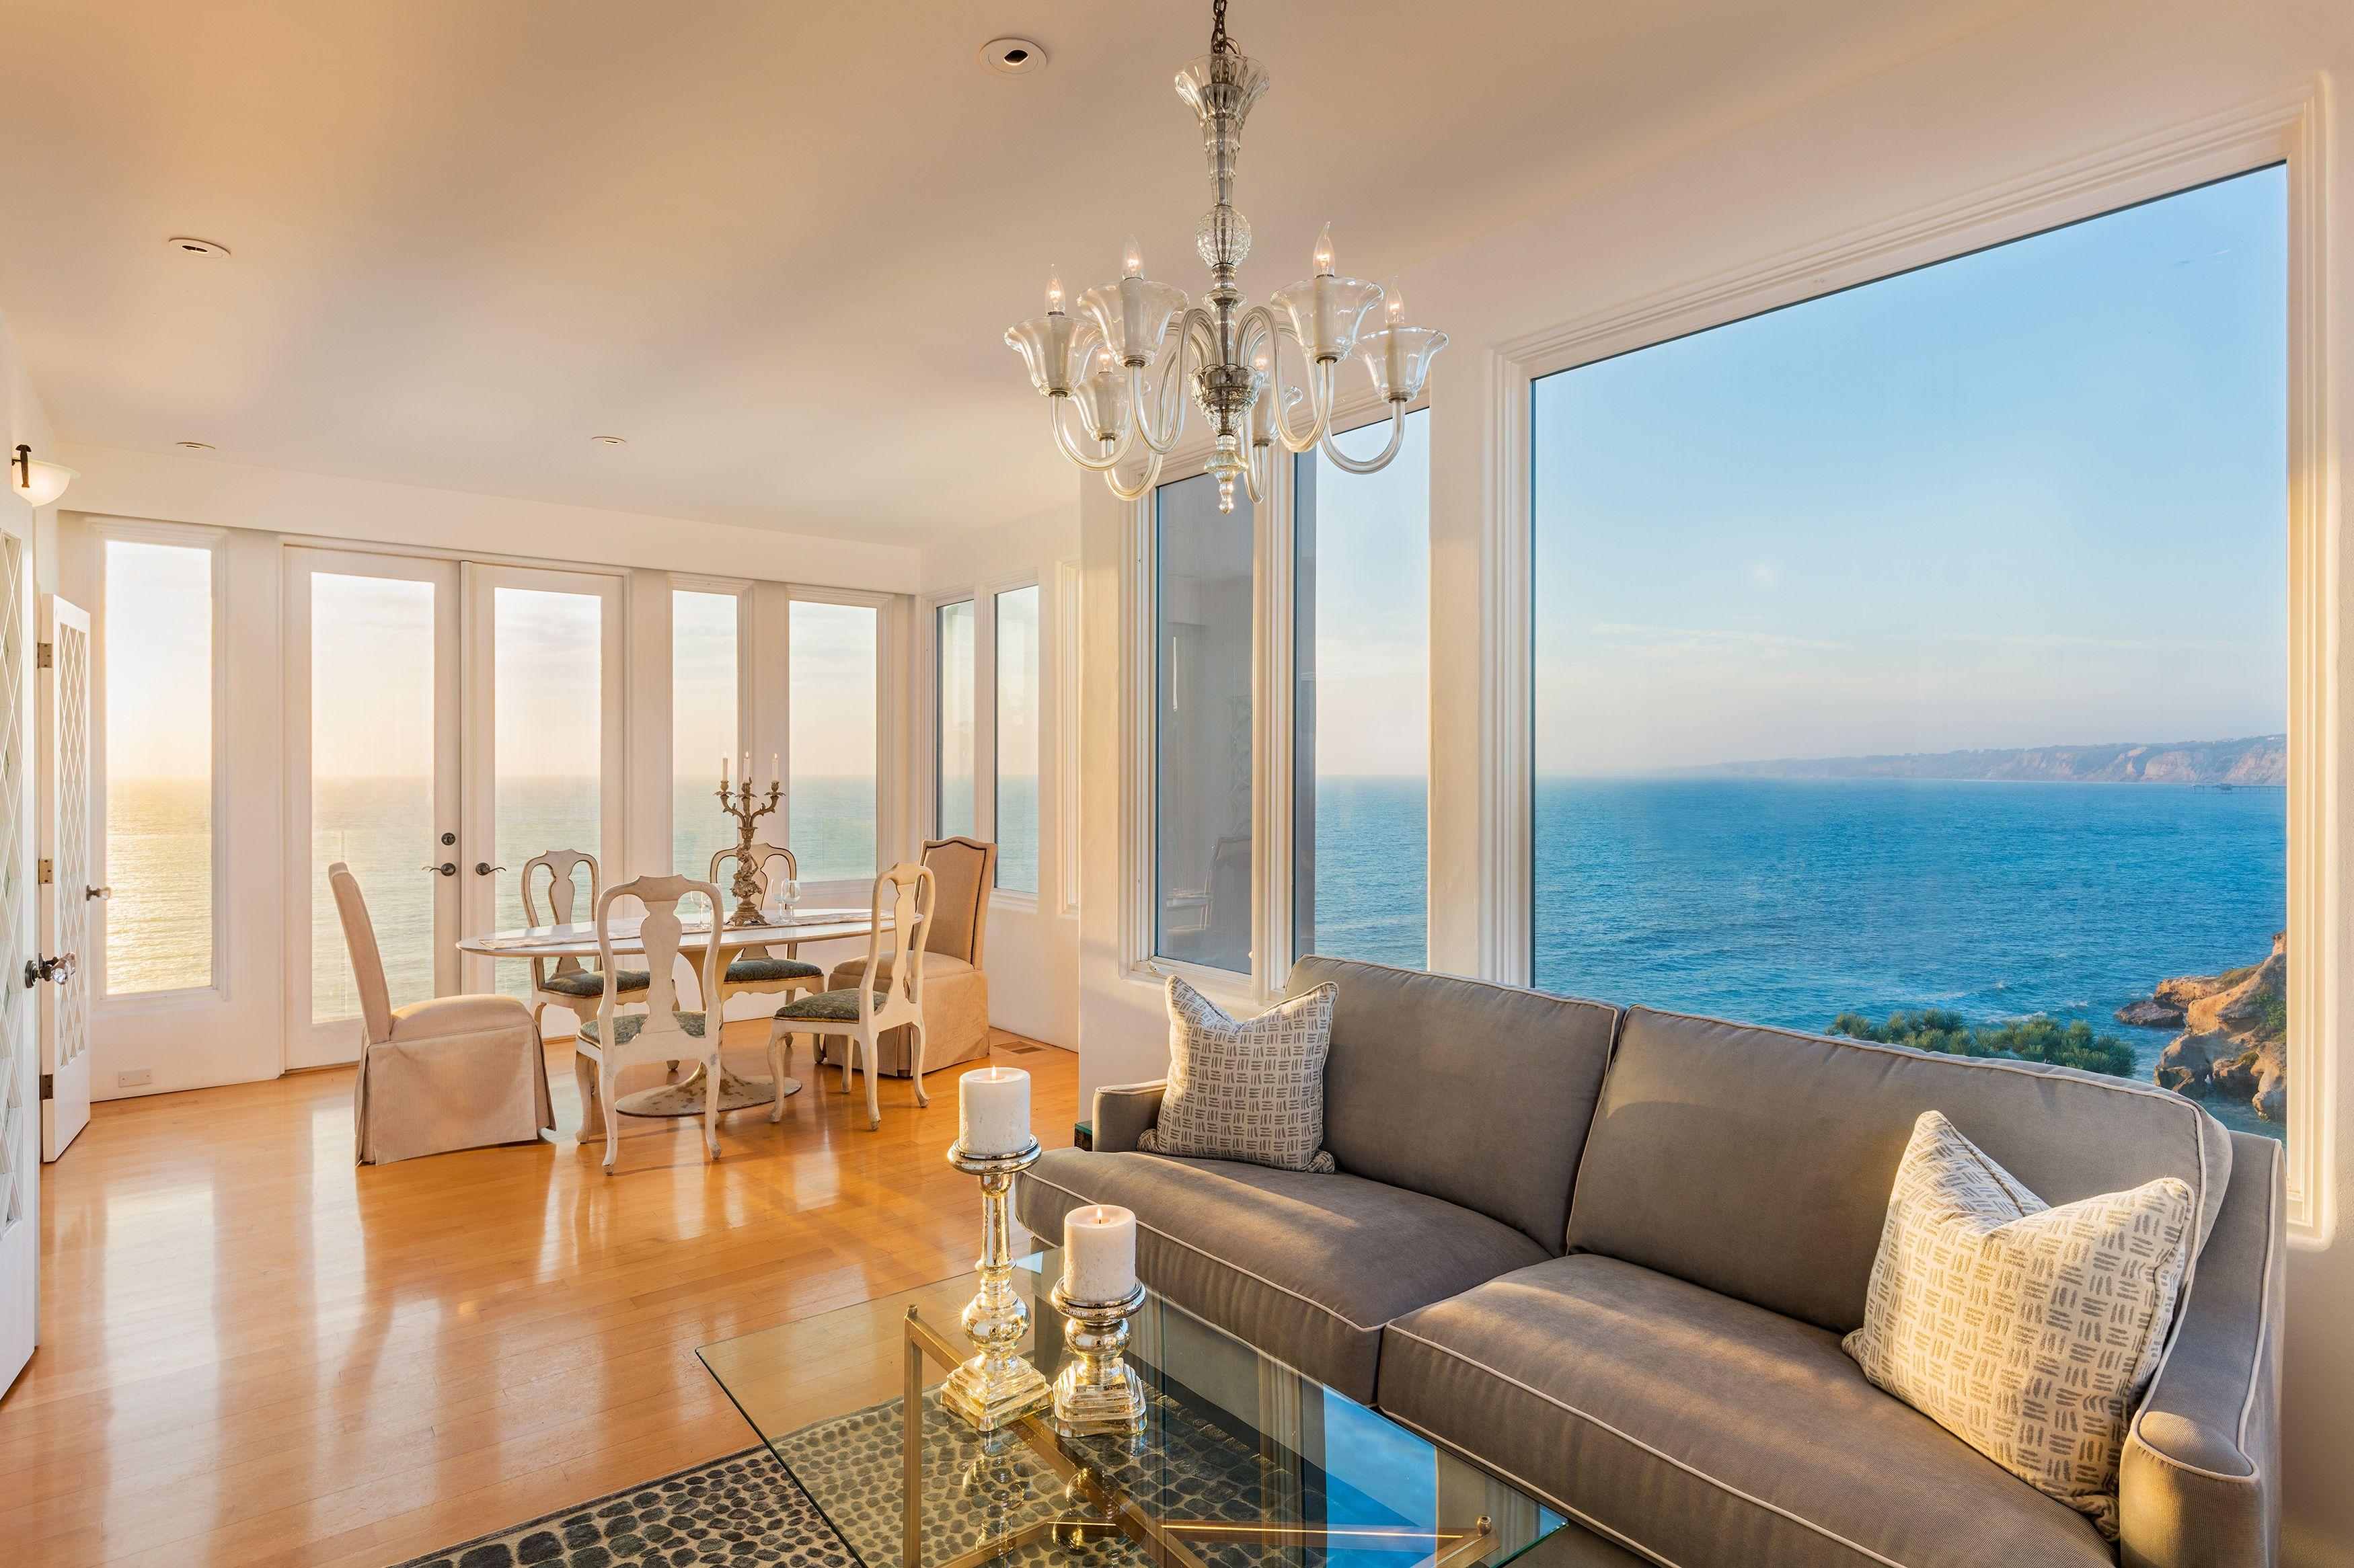 Ocean View from your dining room! La Jolla Luxury life! | La Jolla ...